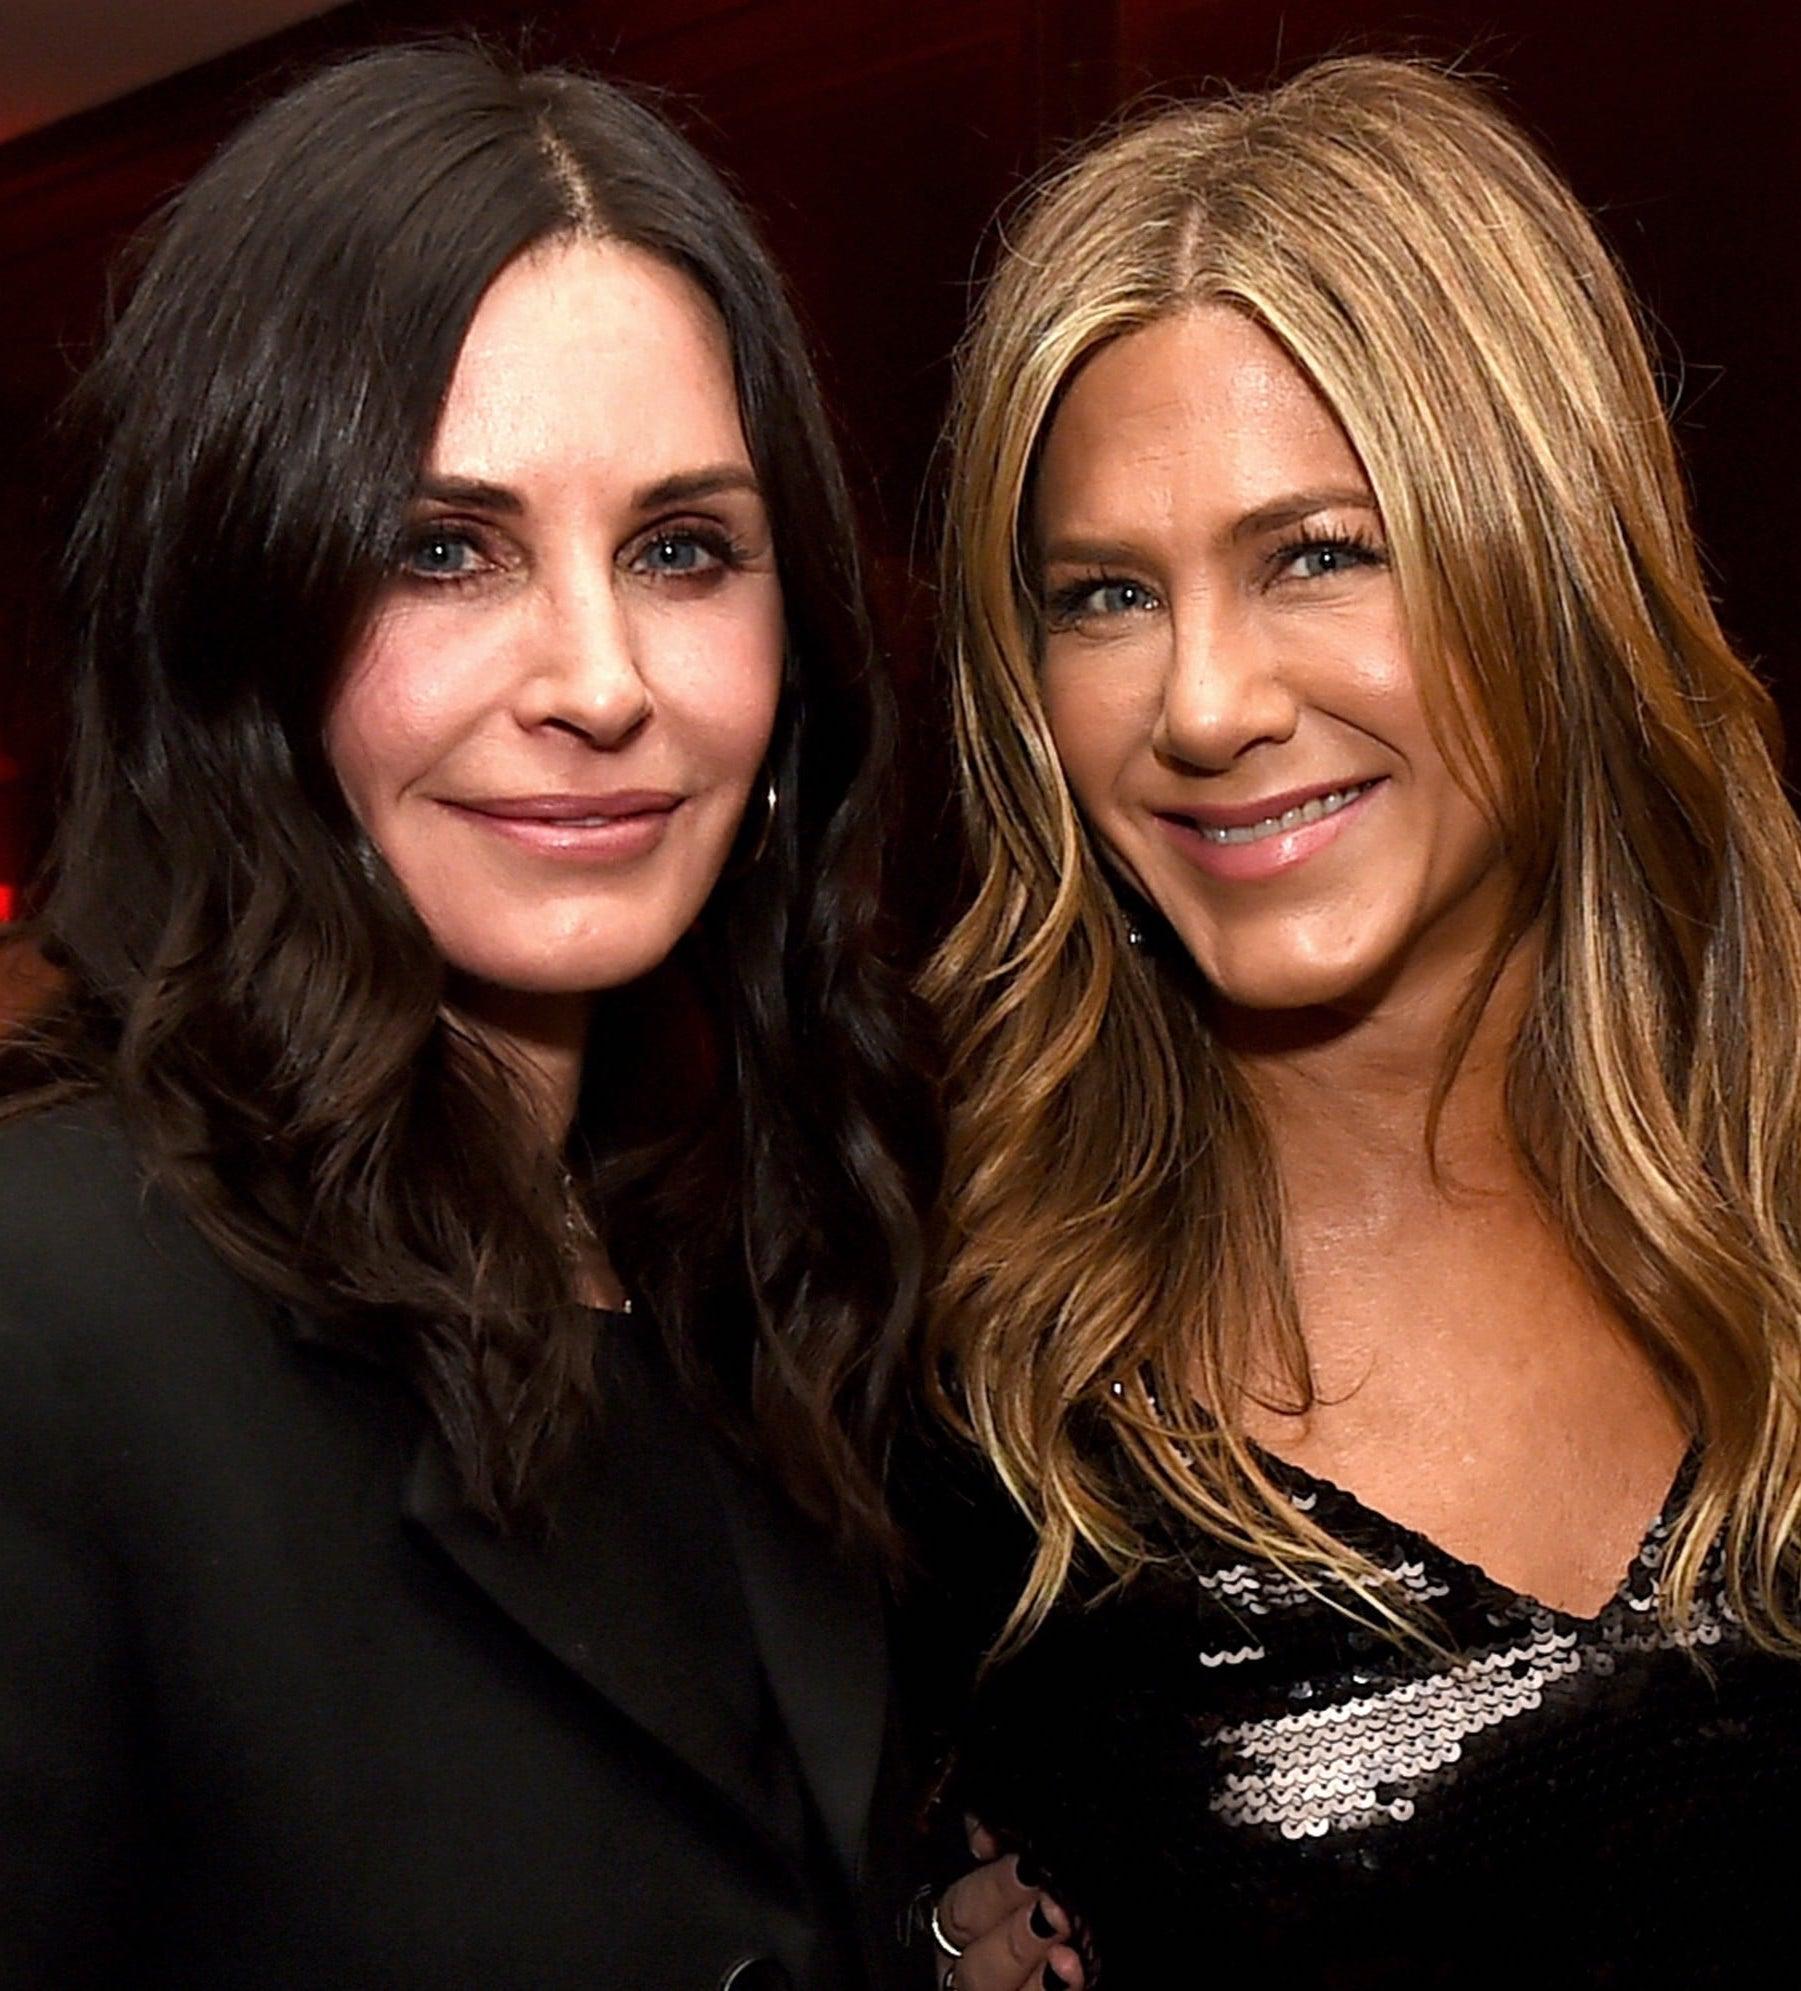 Jennifer Aniston Courteney Cox Dumplin LA Premiere Courteney Cox Reenacts Iconic Friends Scene While Moving Furniture Through Her House